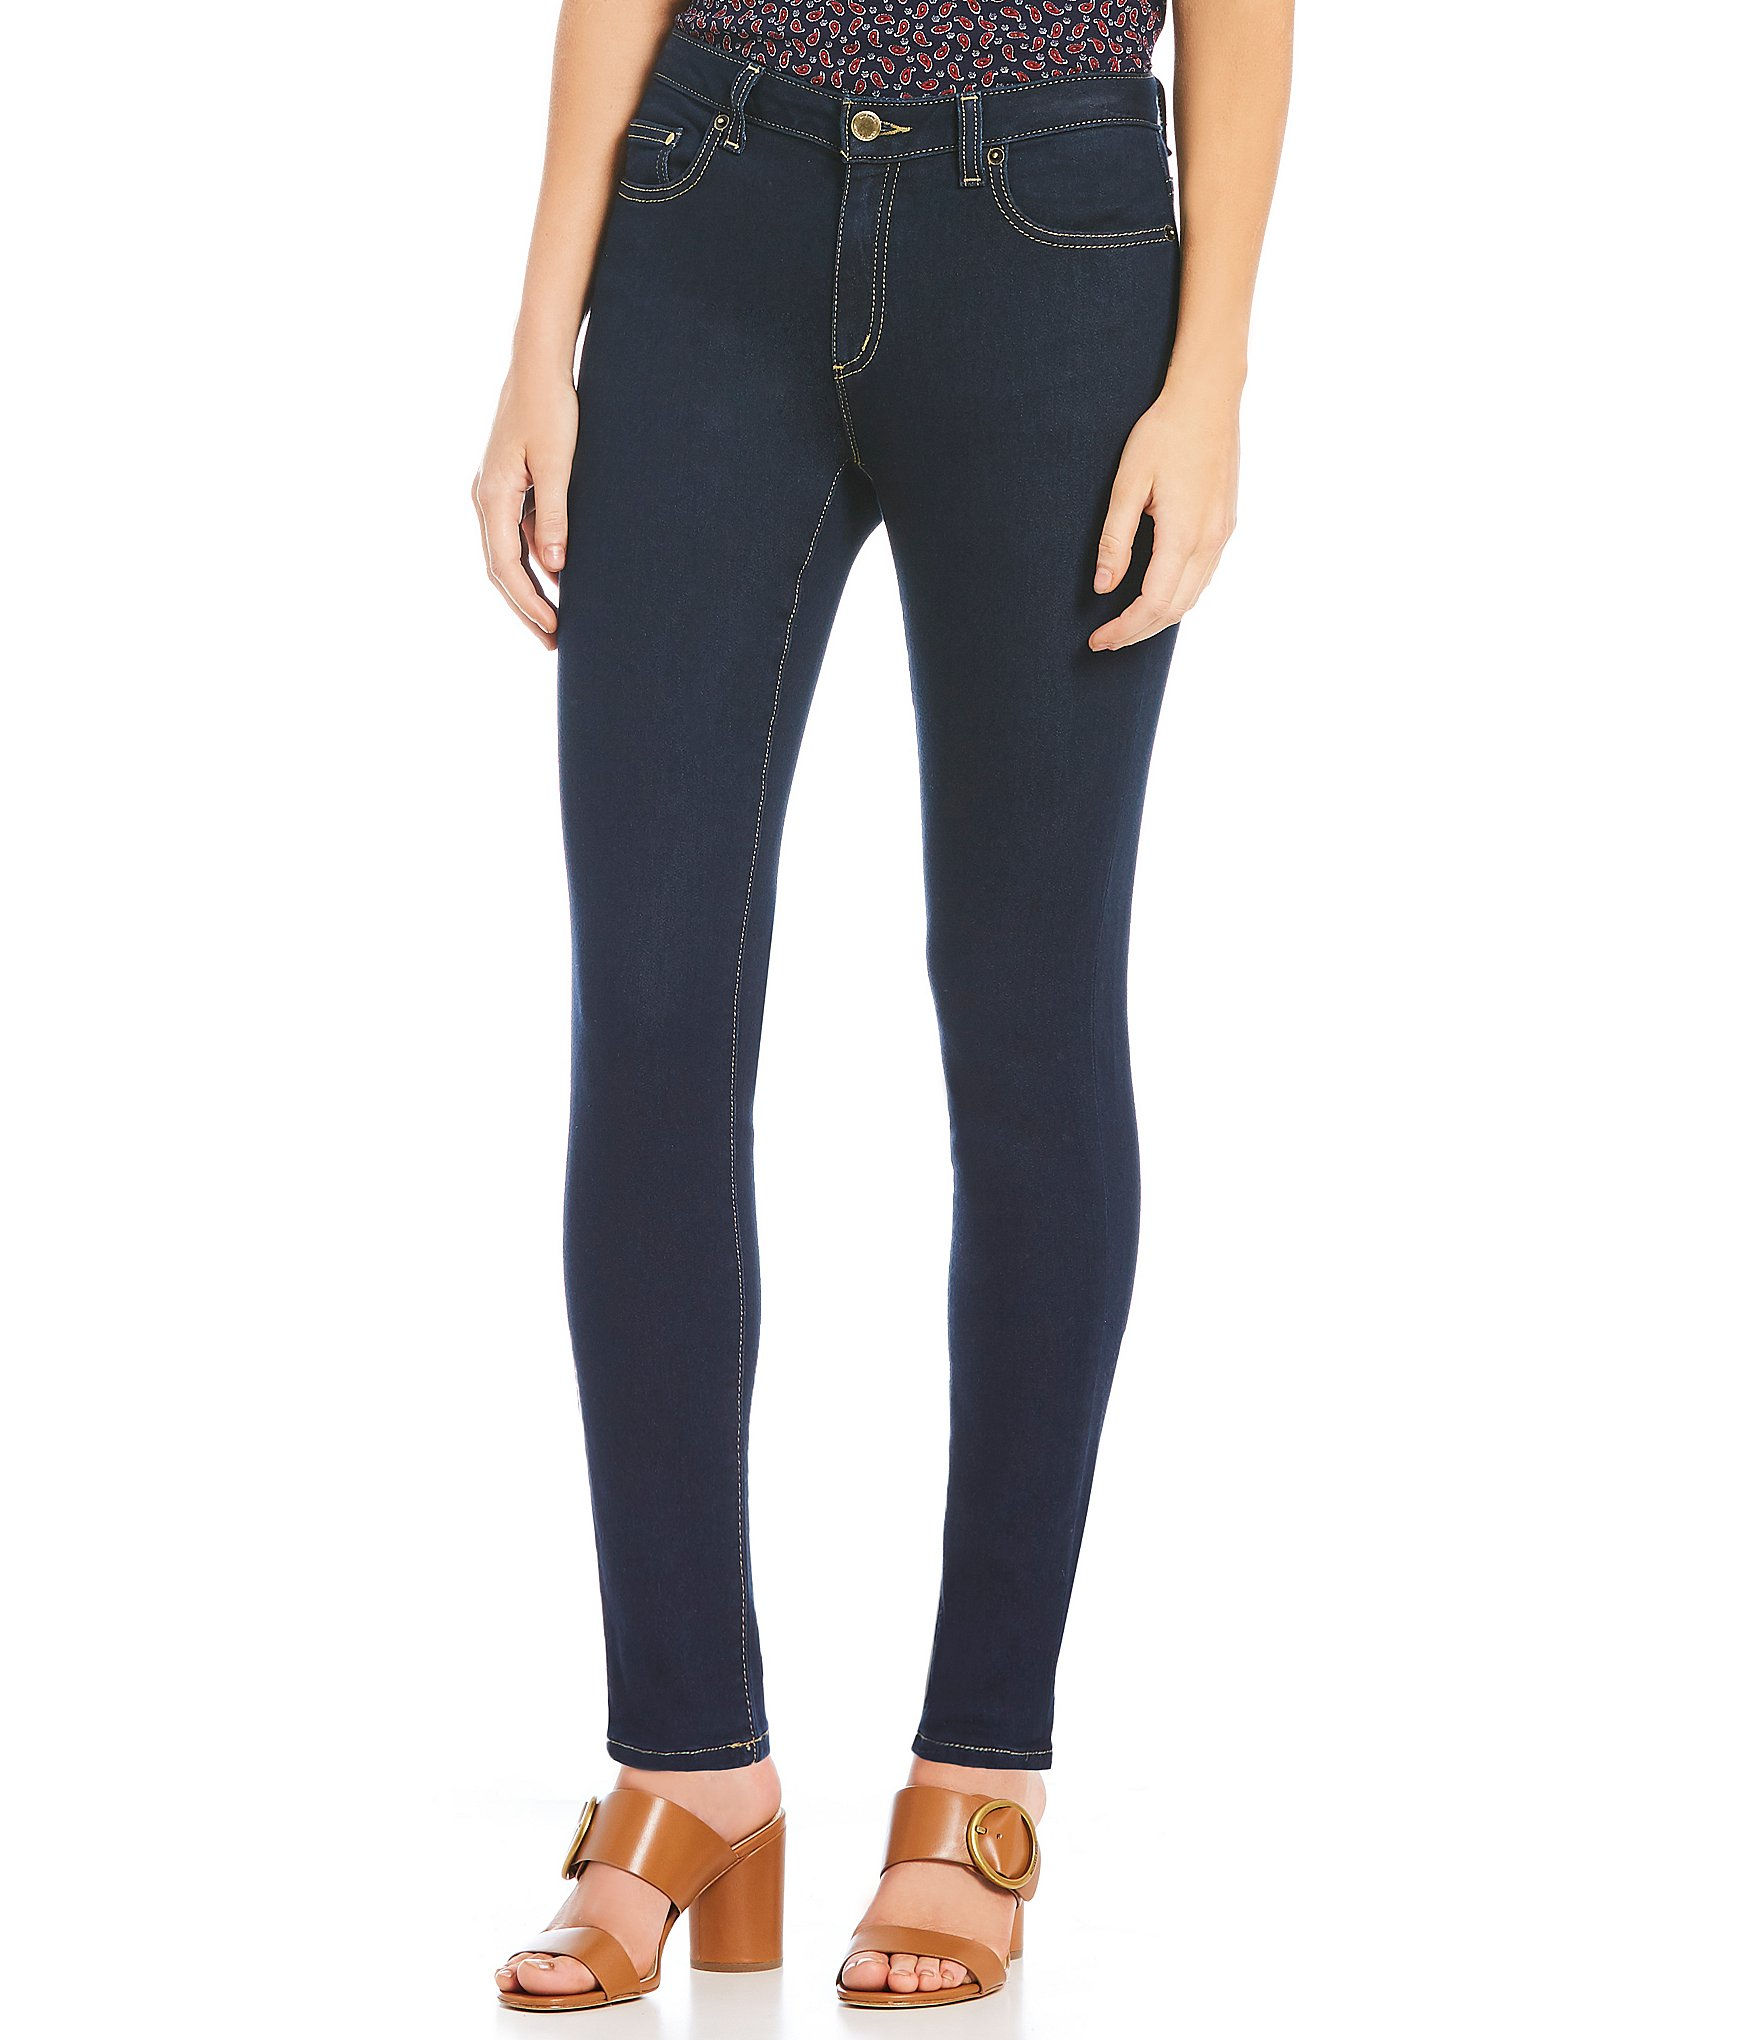 6b220fabbbde MICHAEL Michael Kors Women's Jeans & Denim | Dillard's